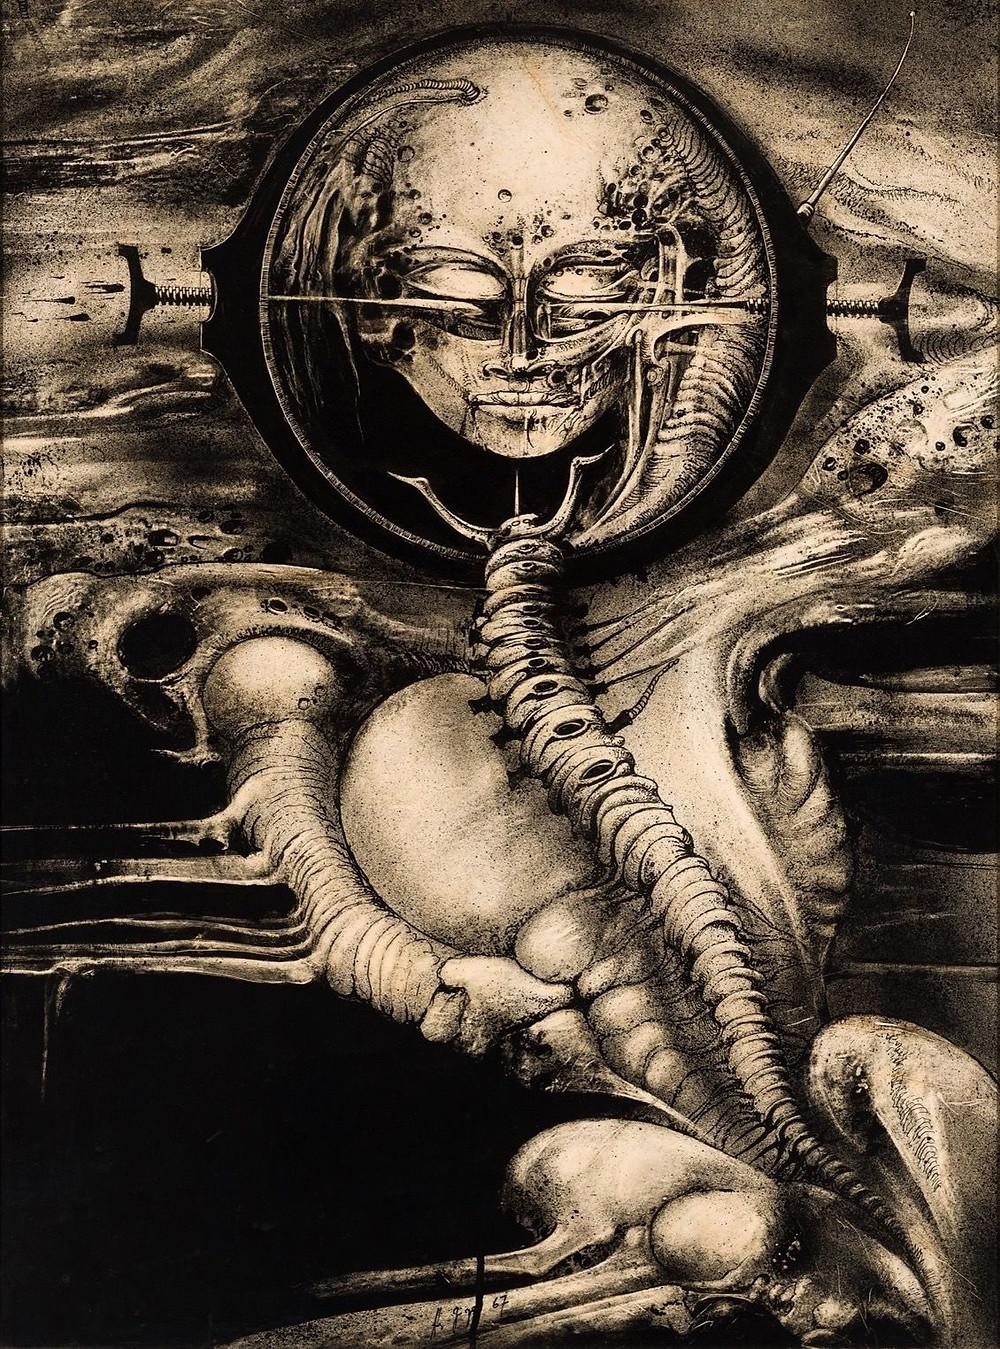 H.R. Giger, Cthulhu (Genius) III, 1967